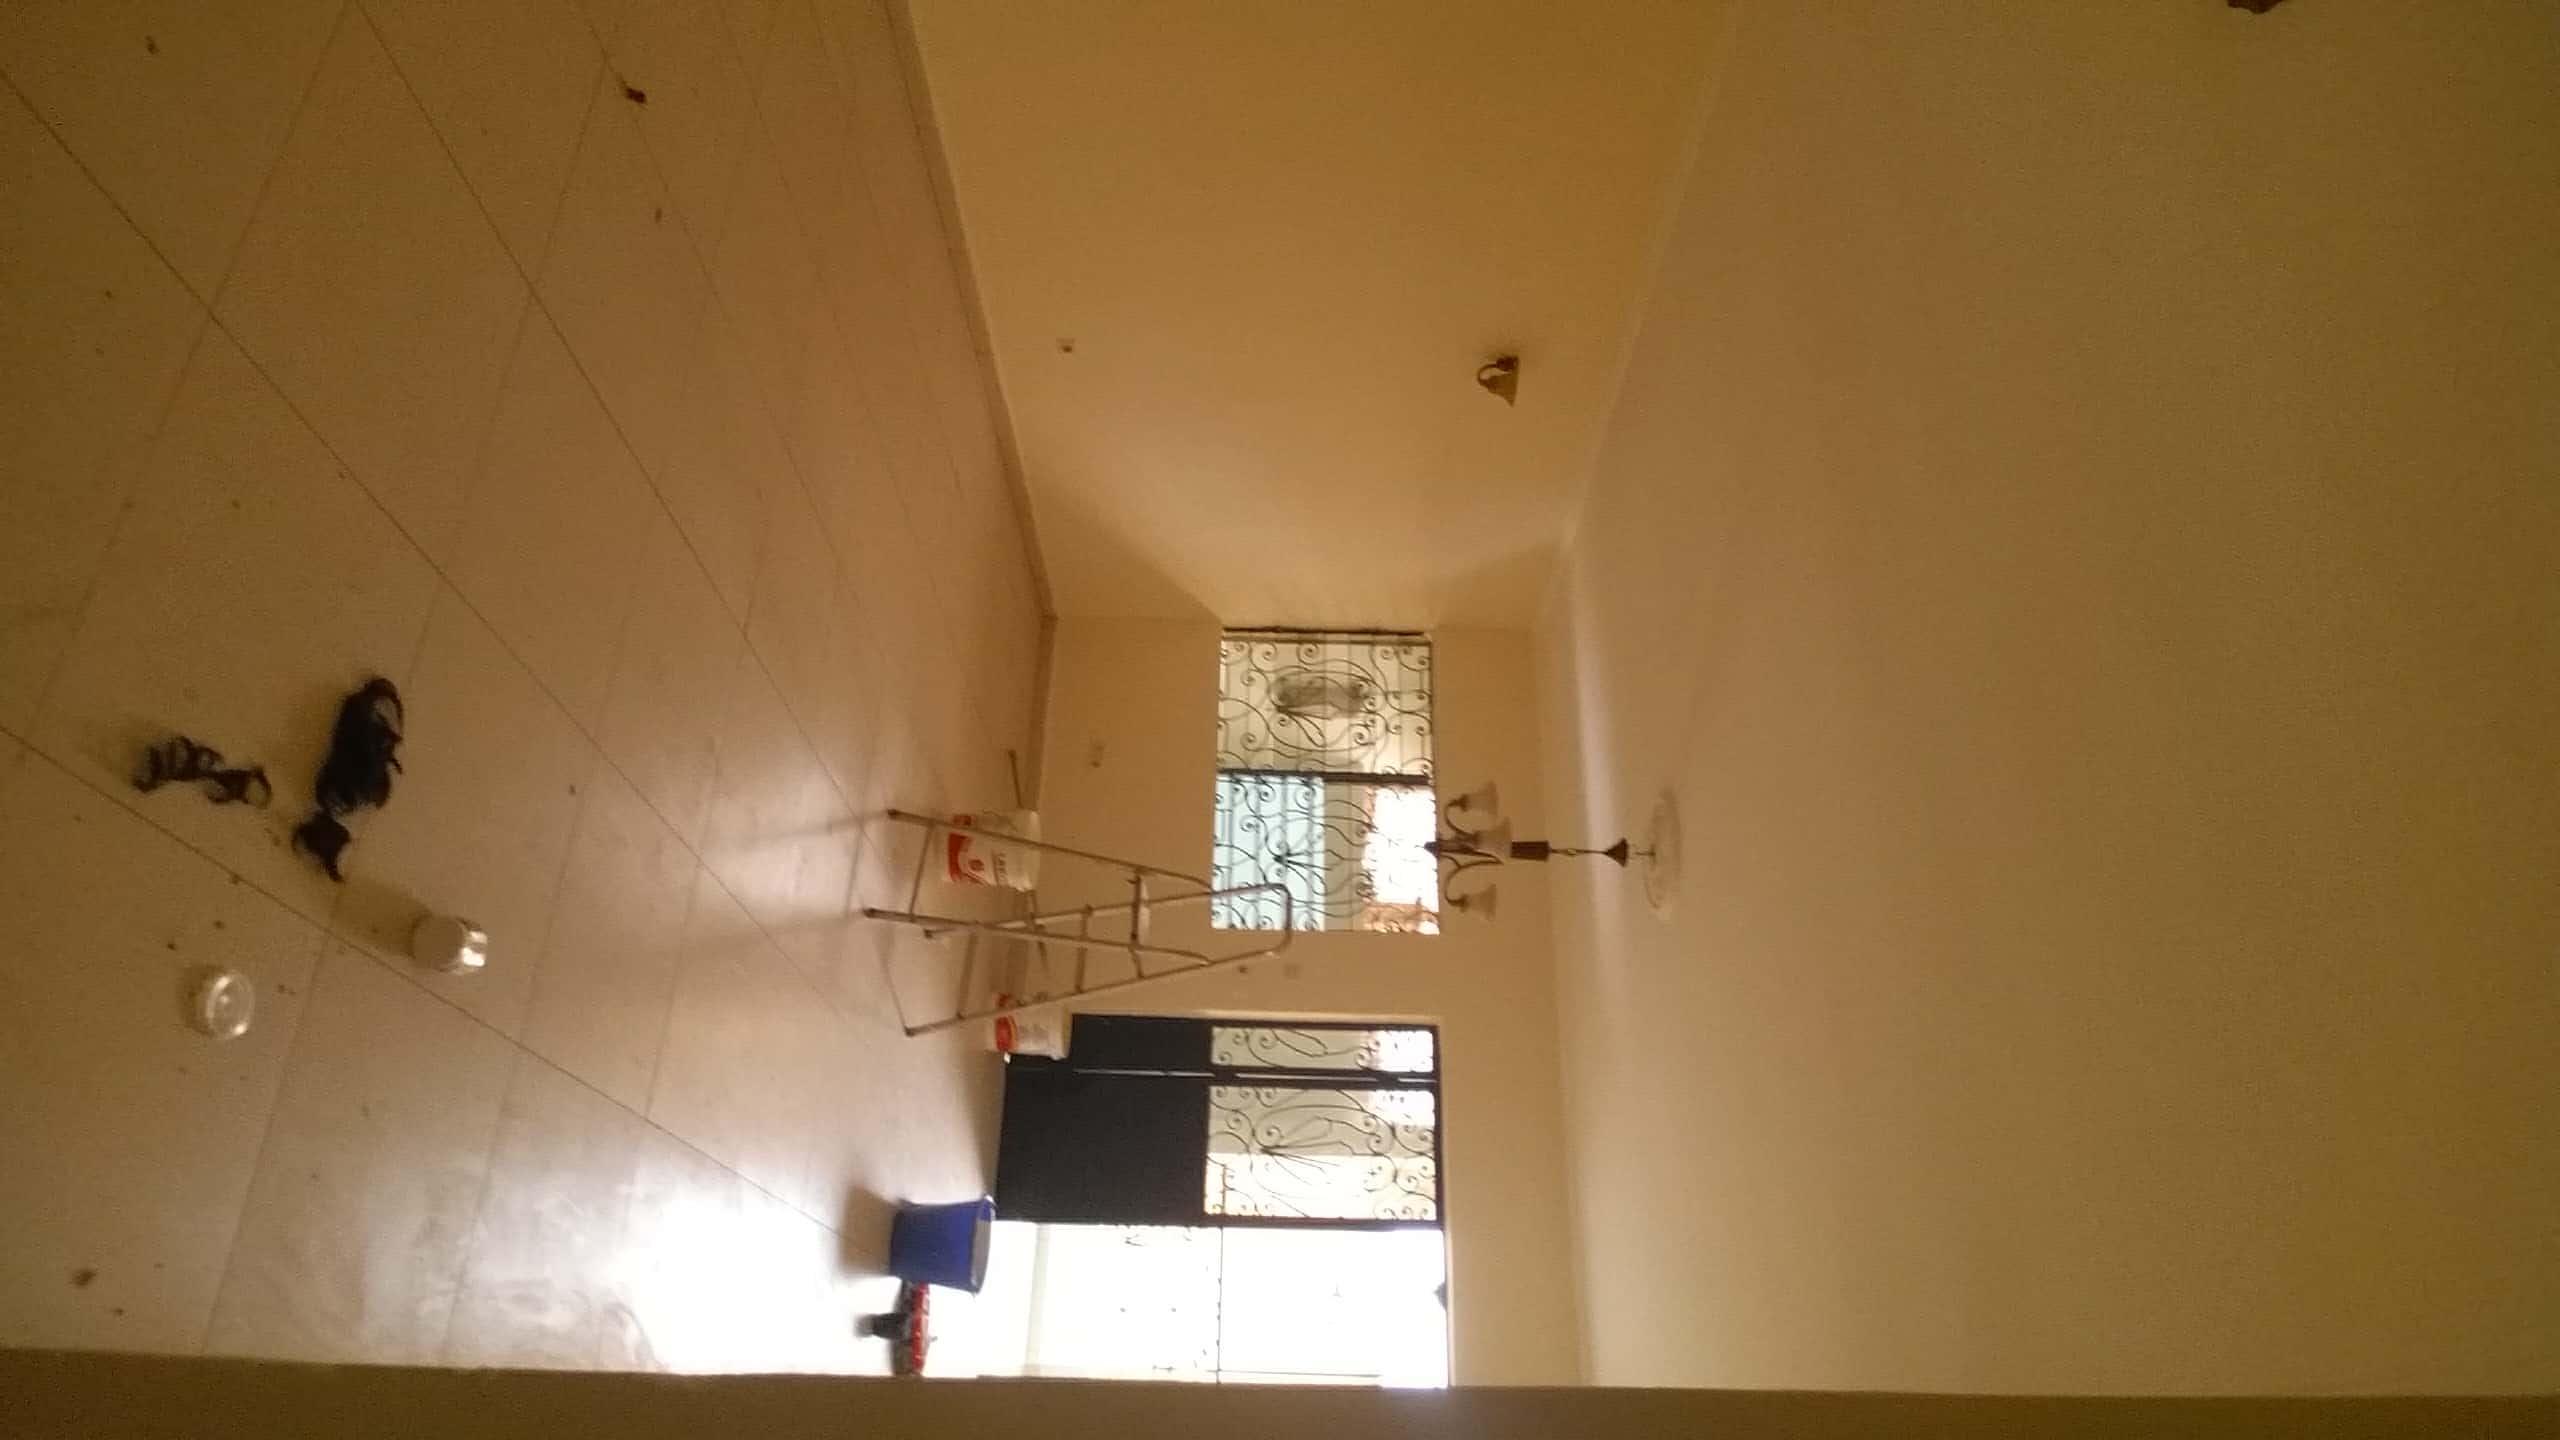 Apartment to rent - Yaoundé, Essos, Mosquée ancienne sonel - 1 living room(s), 3 bedroom(s), 2 bathroom(s) - 200 000 FCFA / month